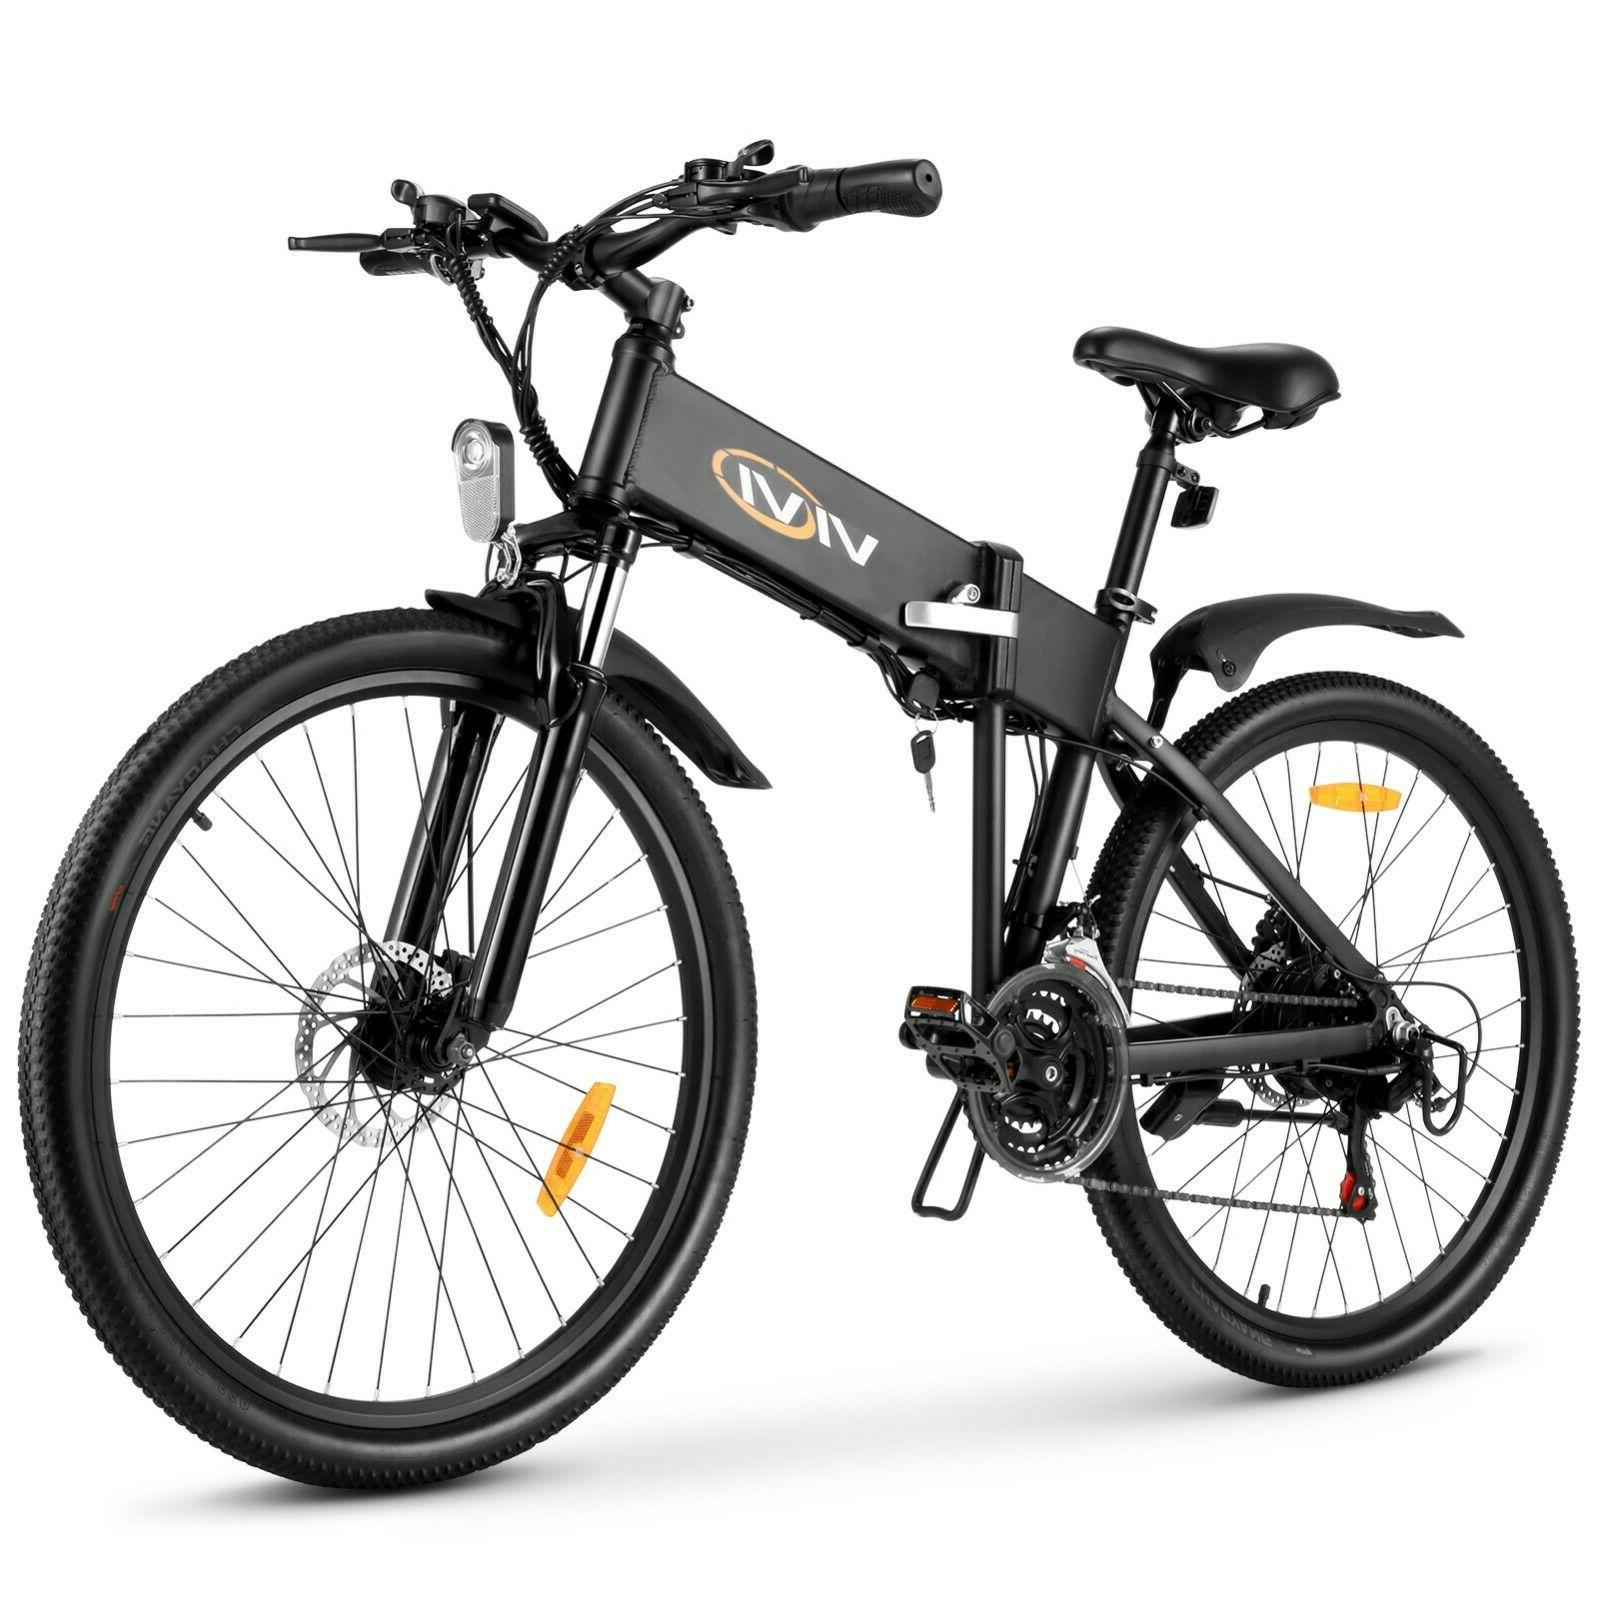 🛴26'' Bike Mountain Bicycle City EBike 21 Speed